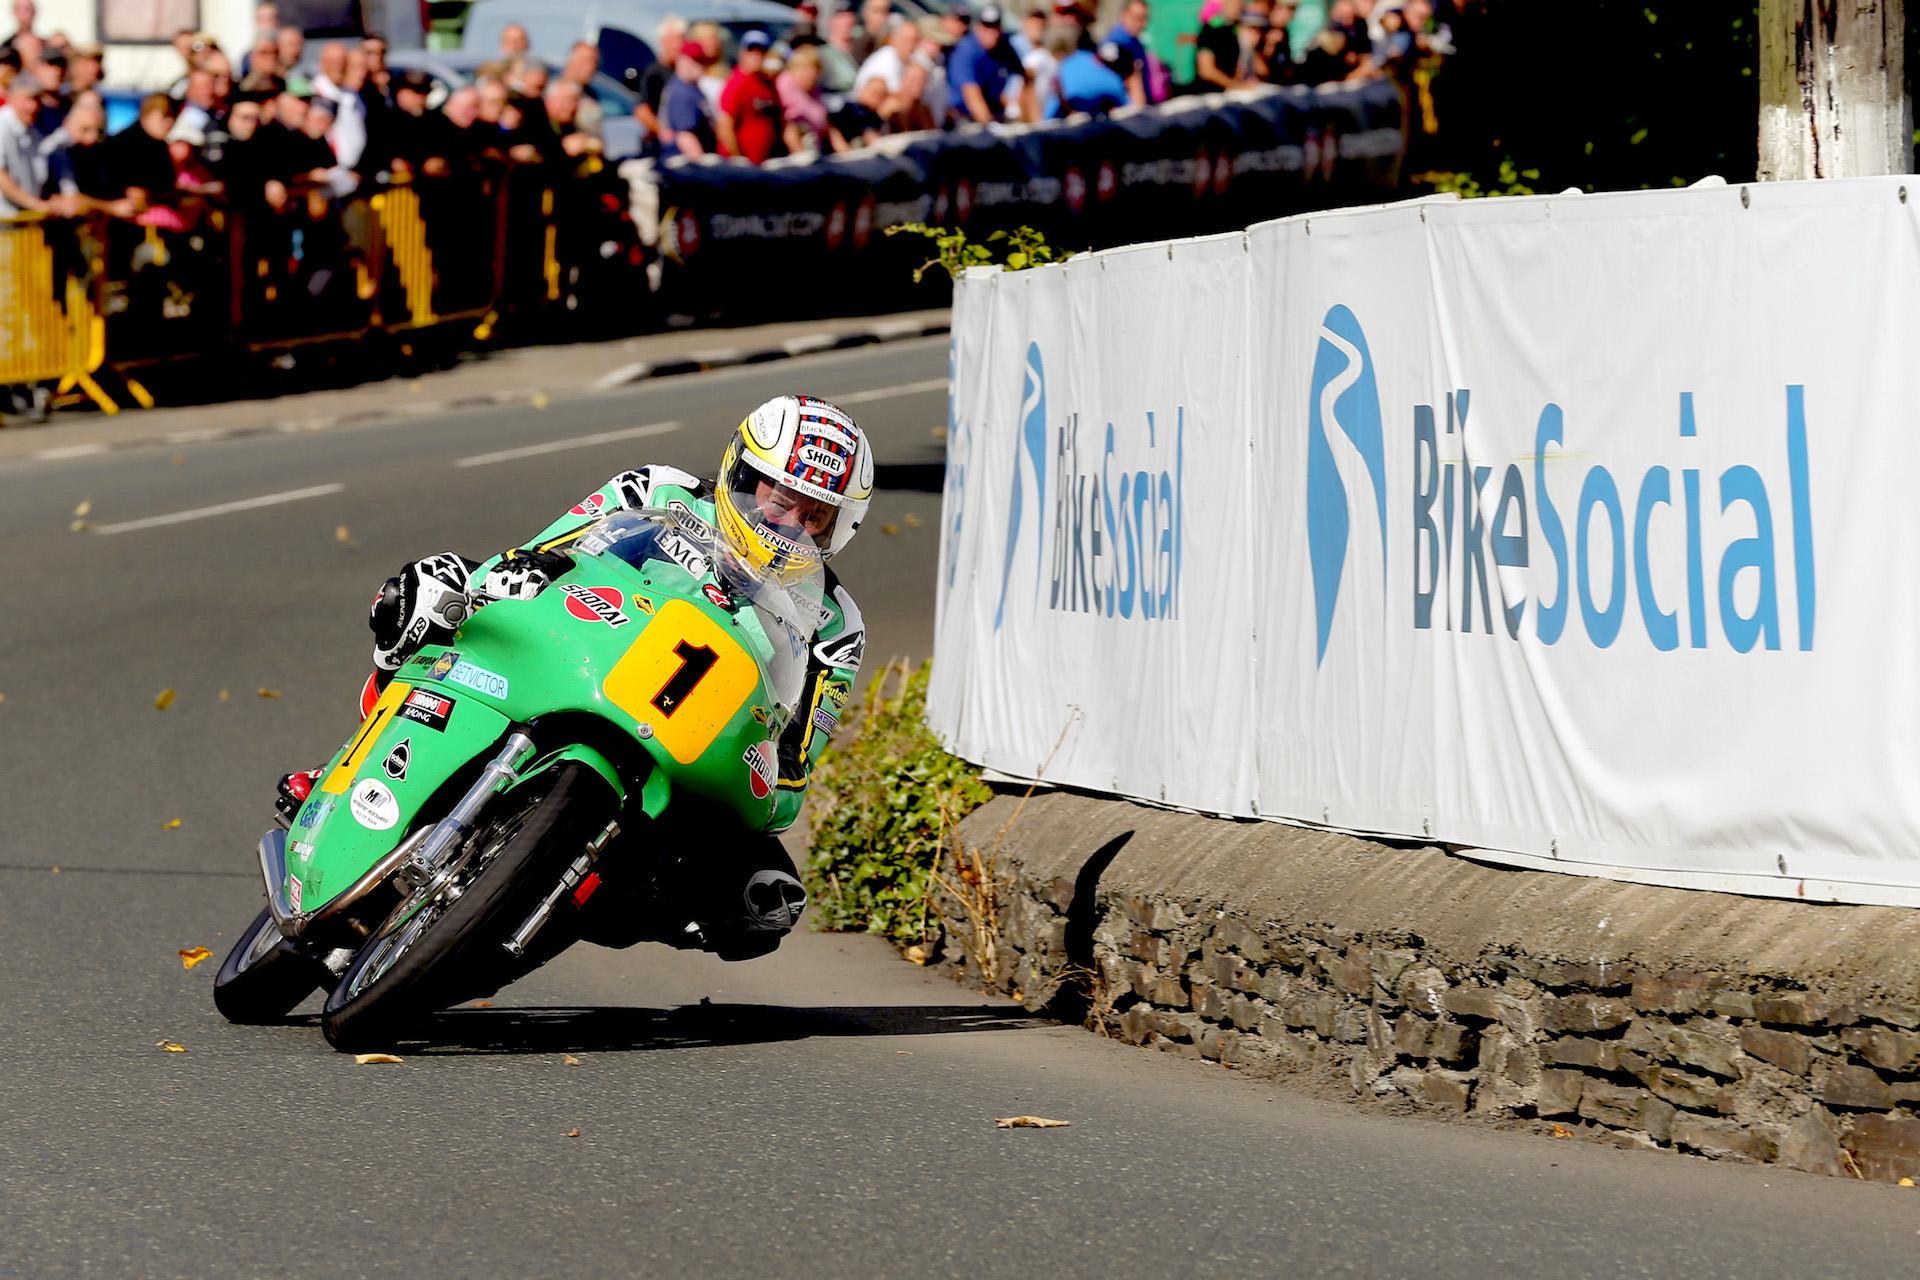 Fin de semana de récords en Classic TT con Michael Dunlop & Co